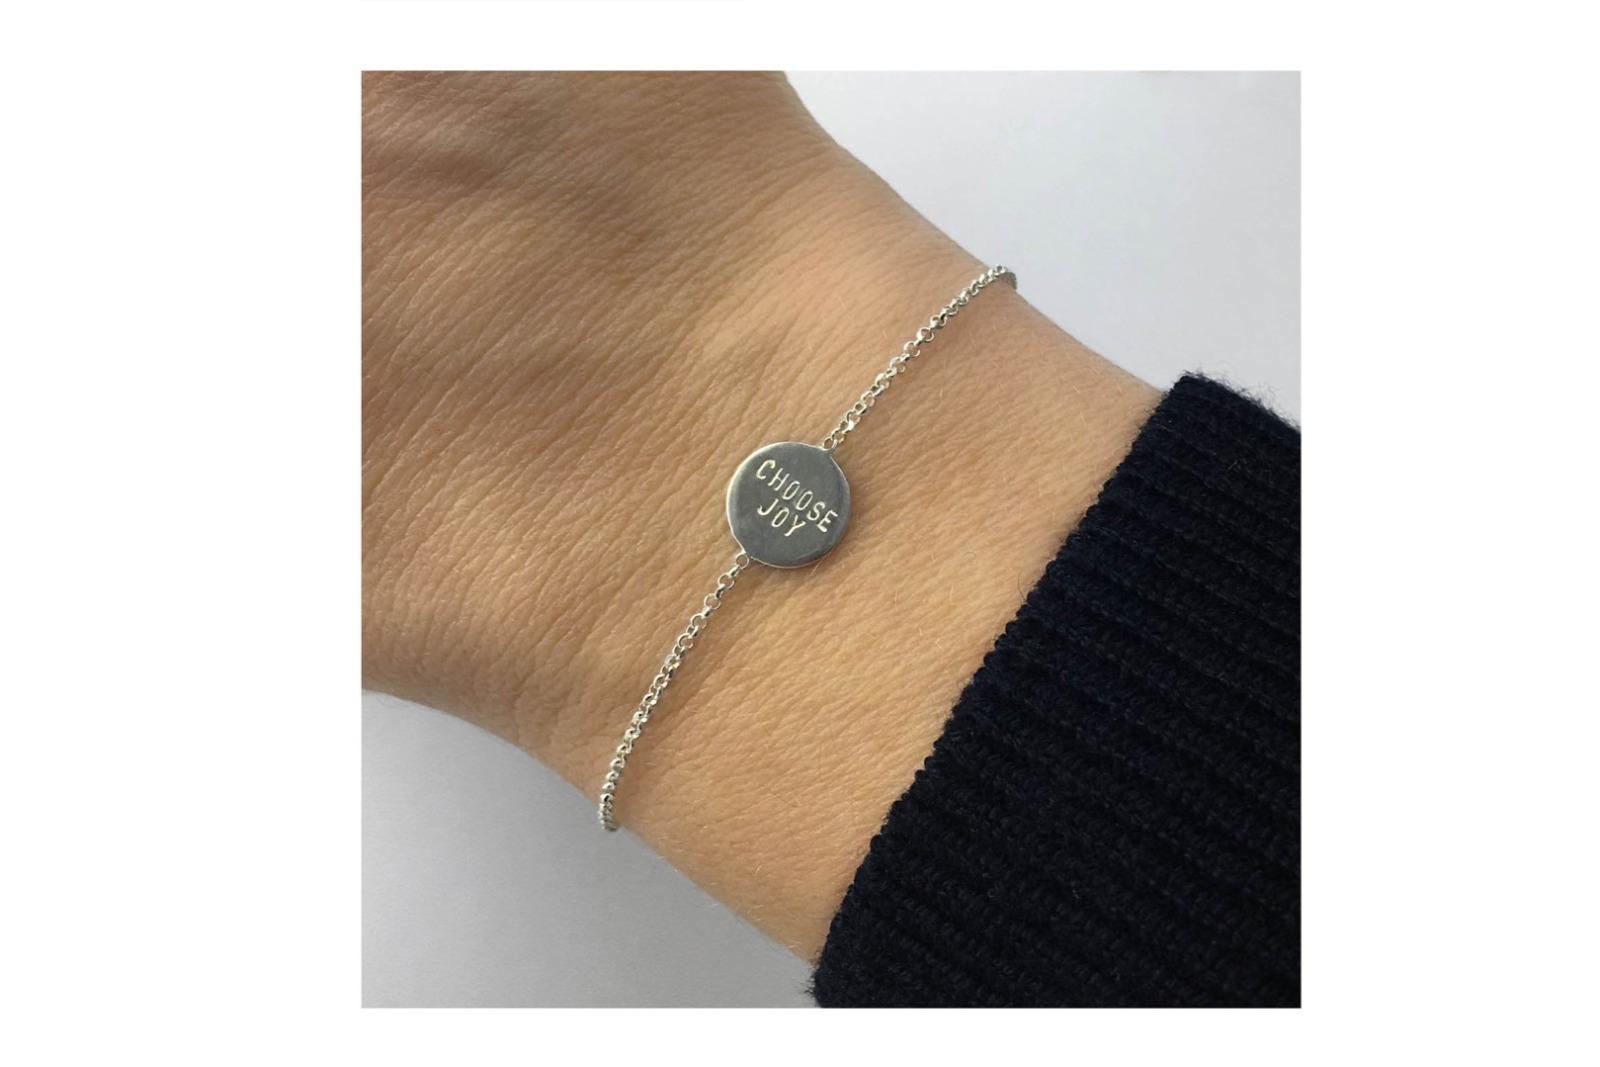 Zartes Silberarmband 2 - Namens-, Geburts-, Sprucharmband - 2